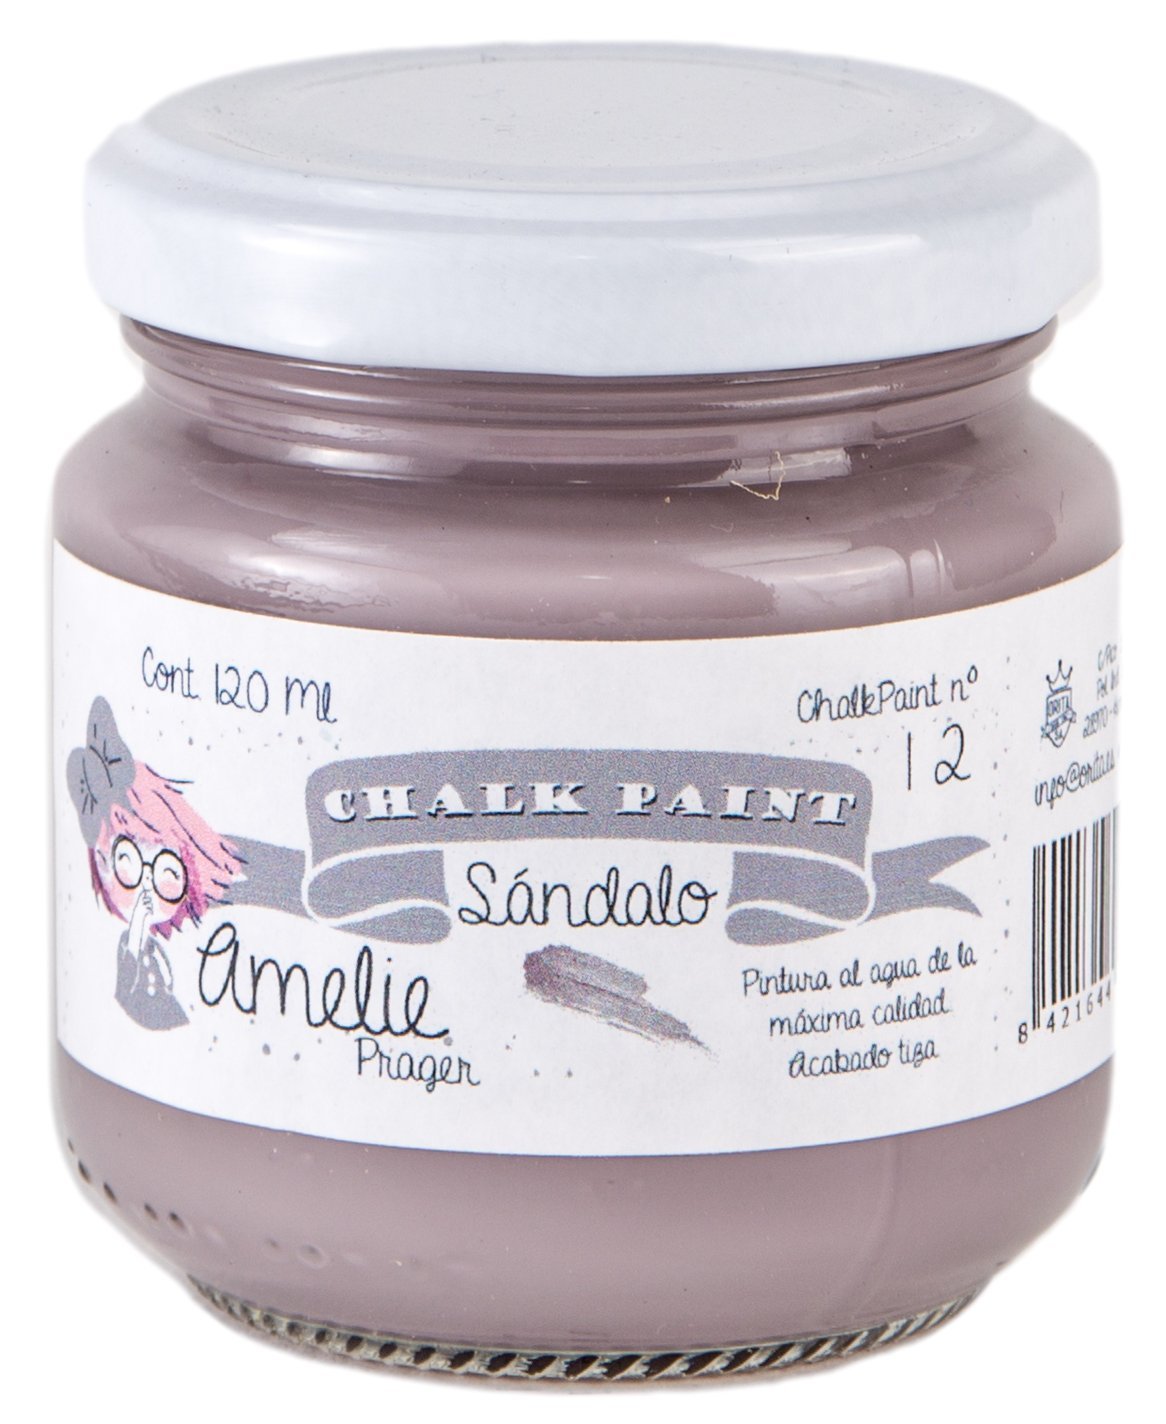 Amelie Prager 120 –  12 Paint to The Chalk, Sandalwood, 120 ml 120ml Orita 120-12